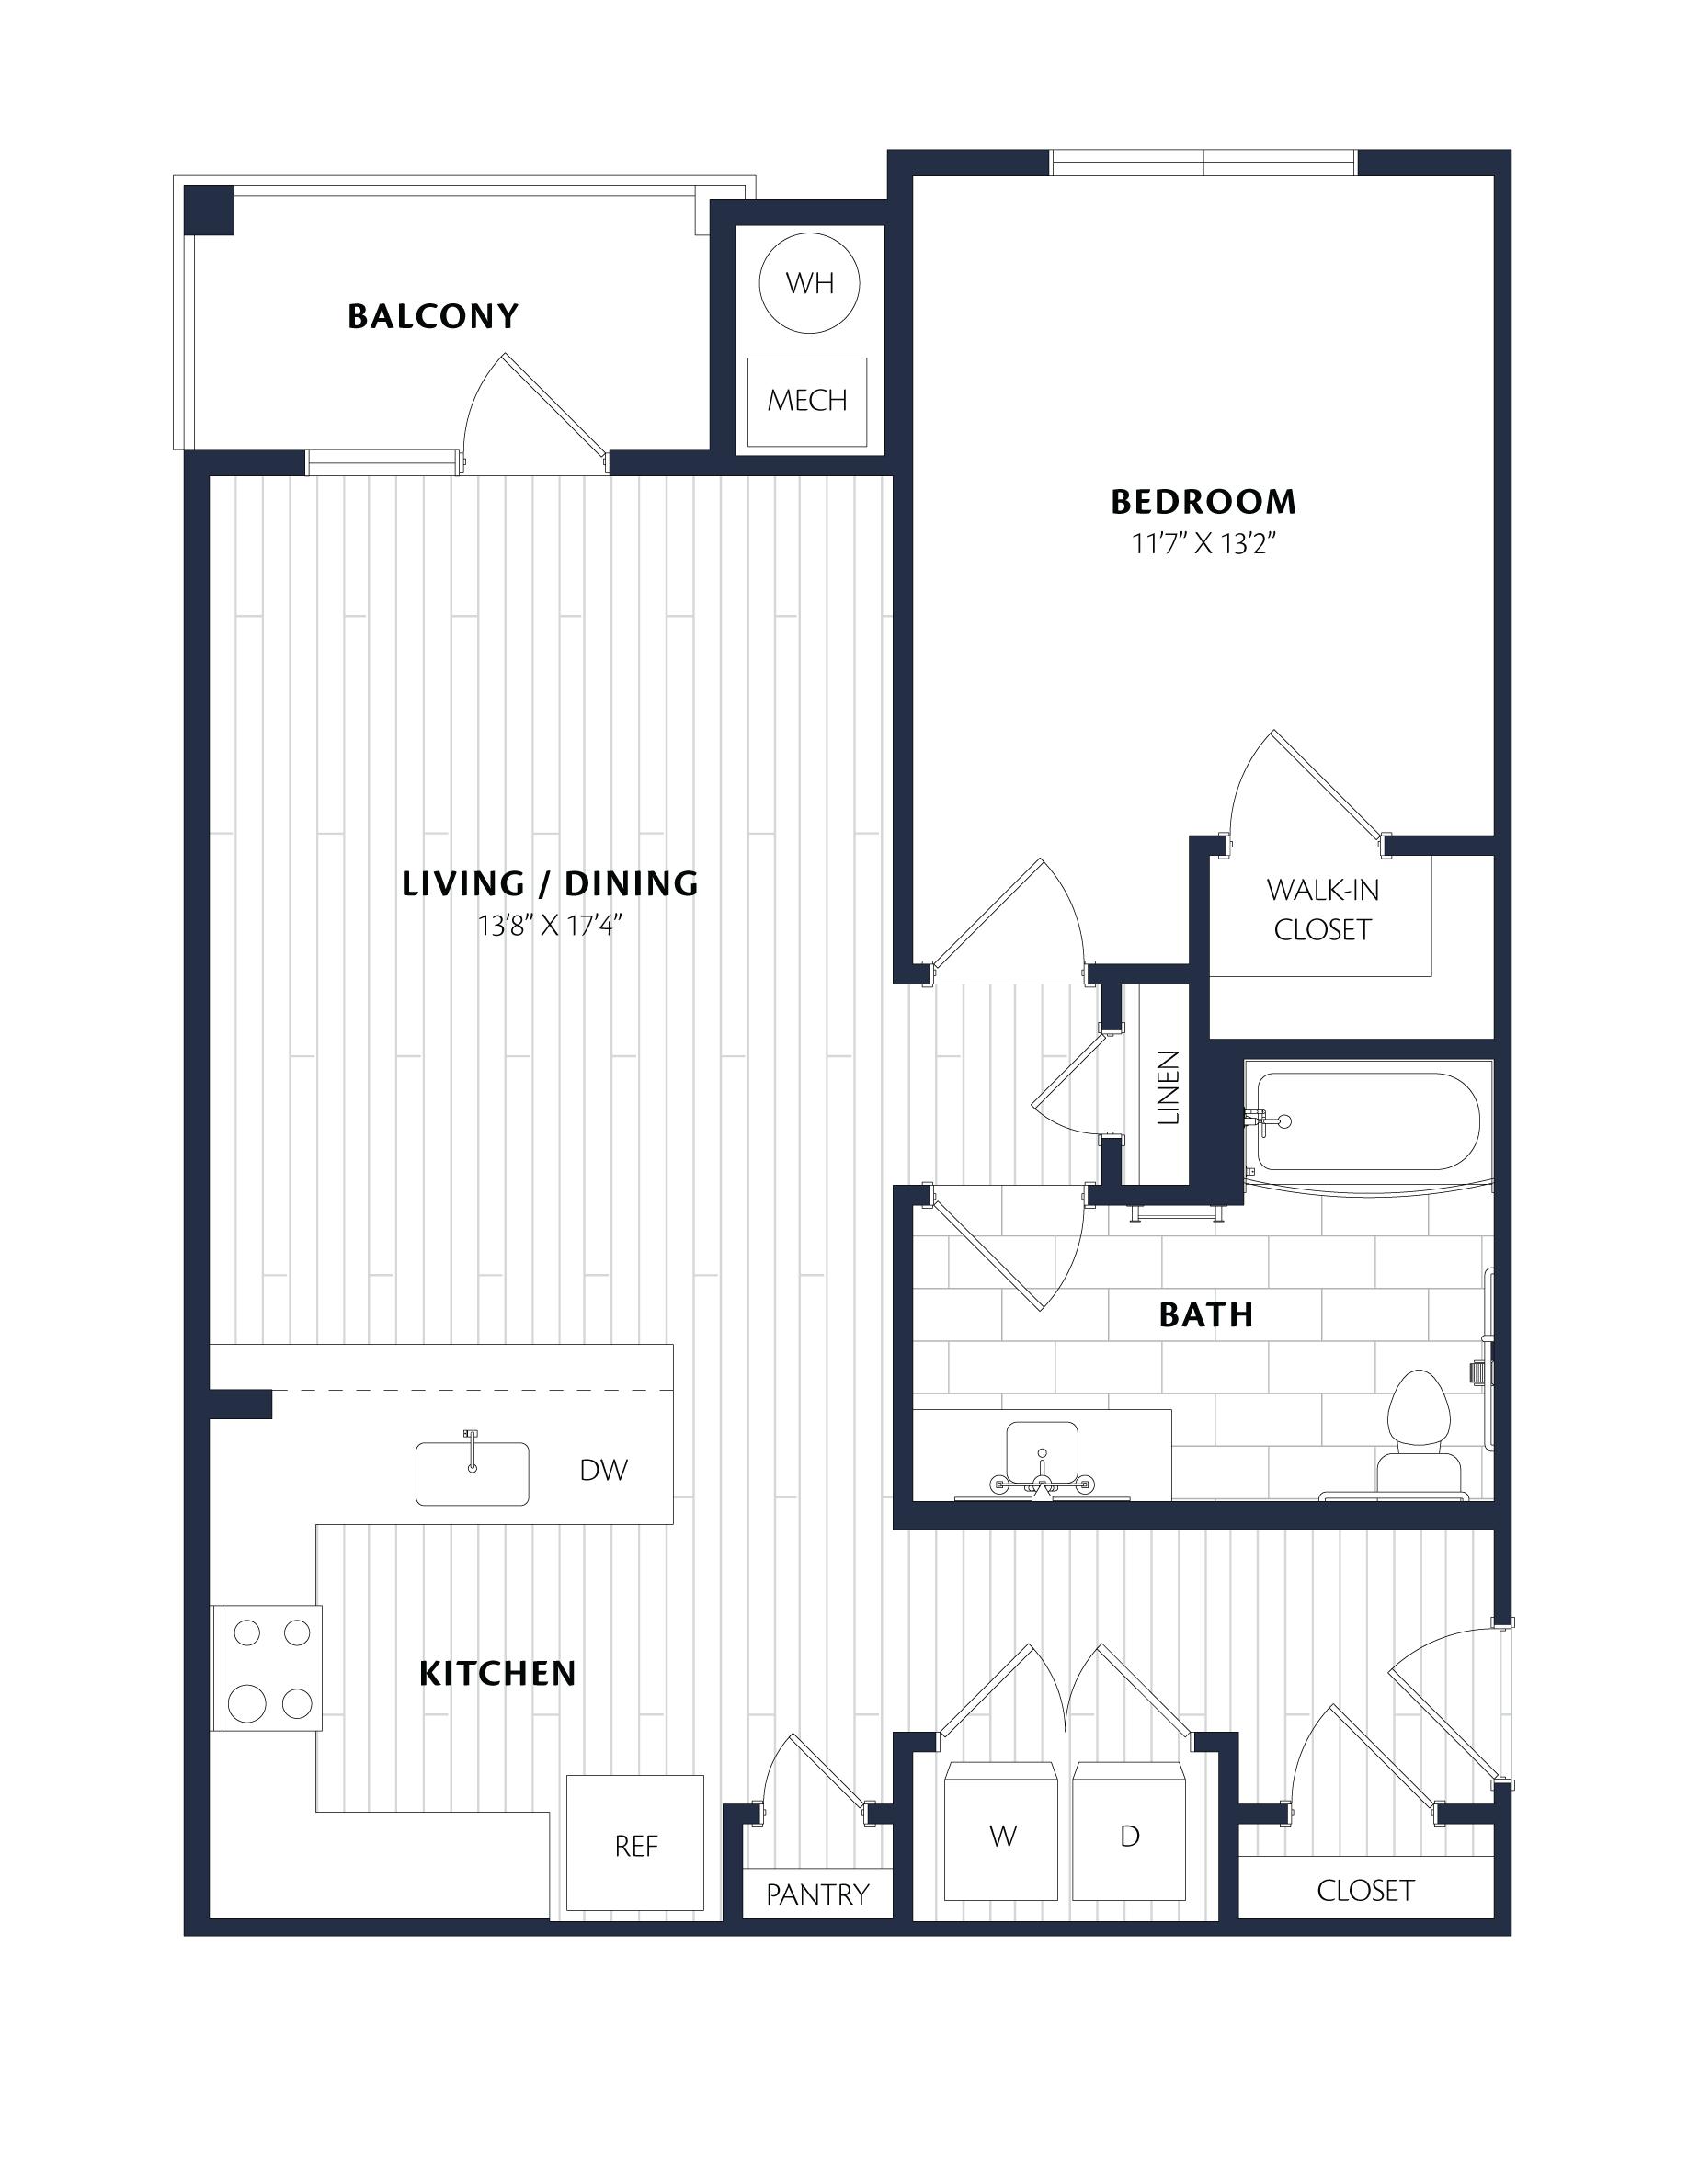 Apartment 3212 floorplan